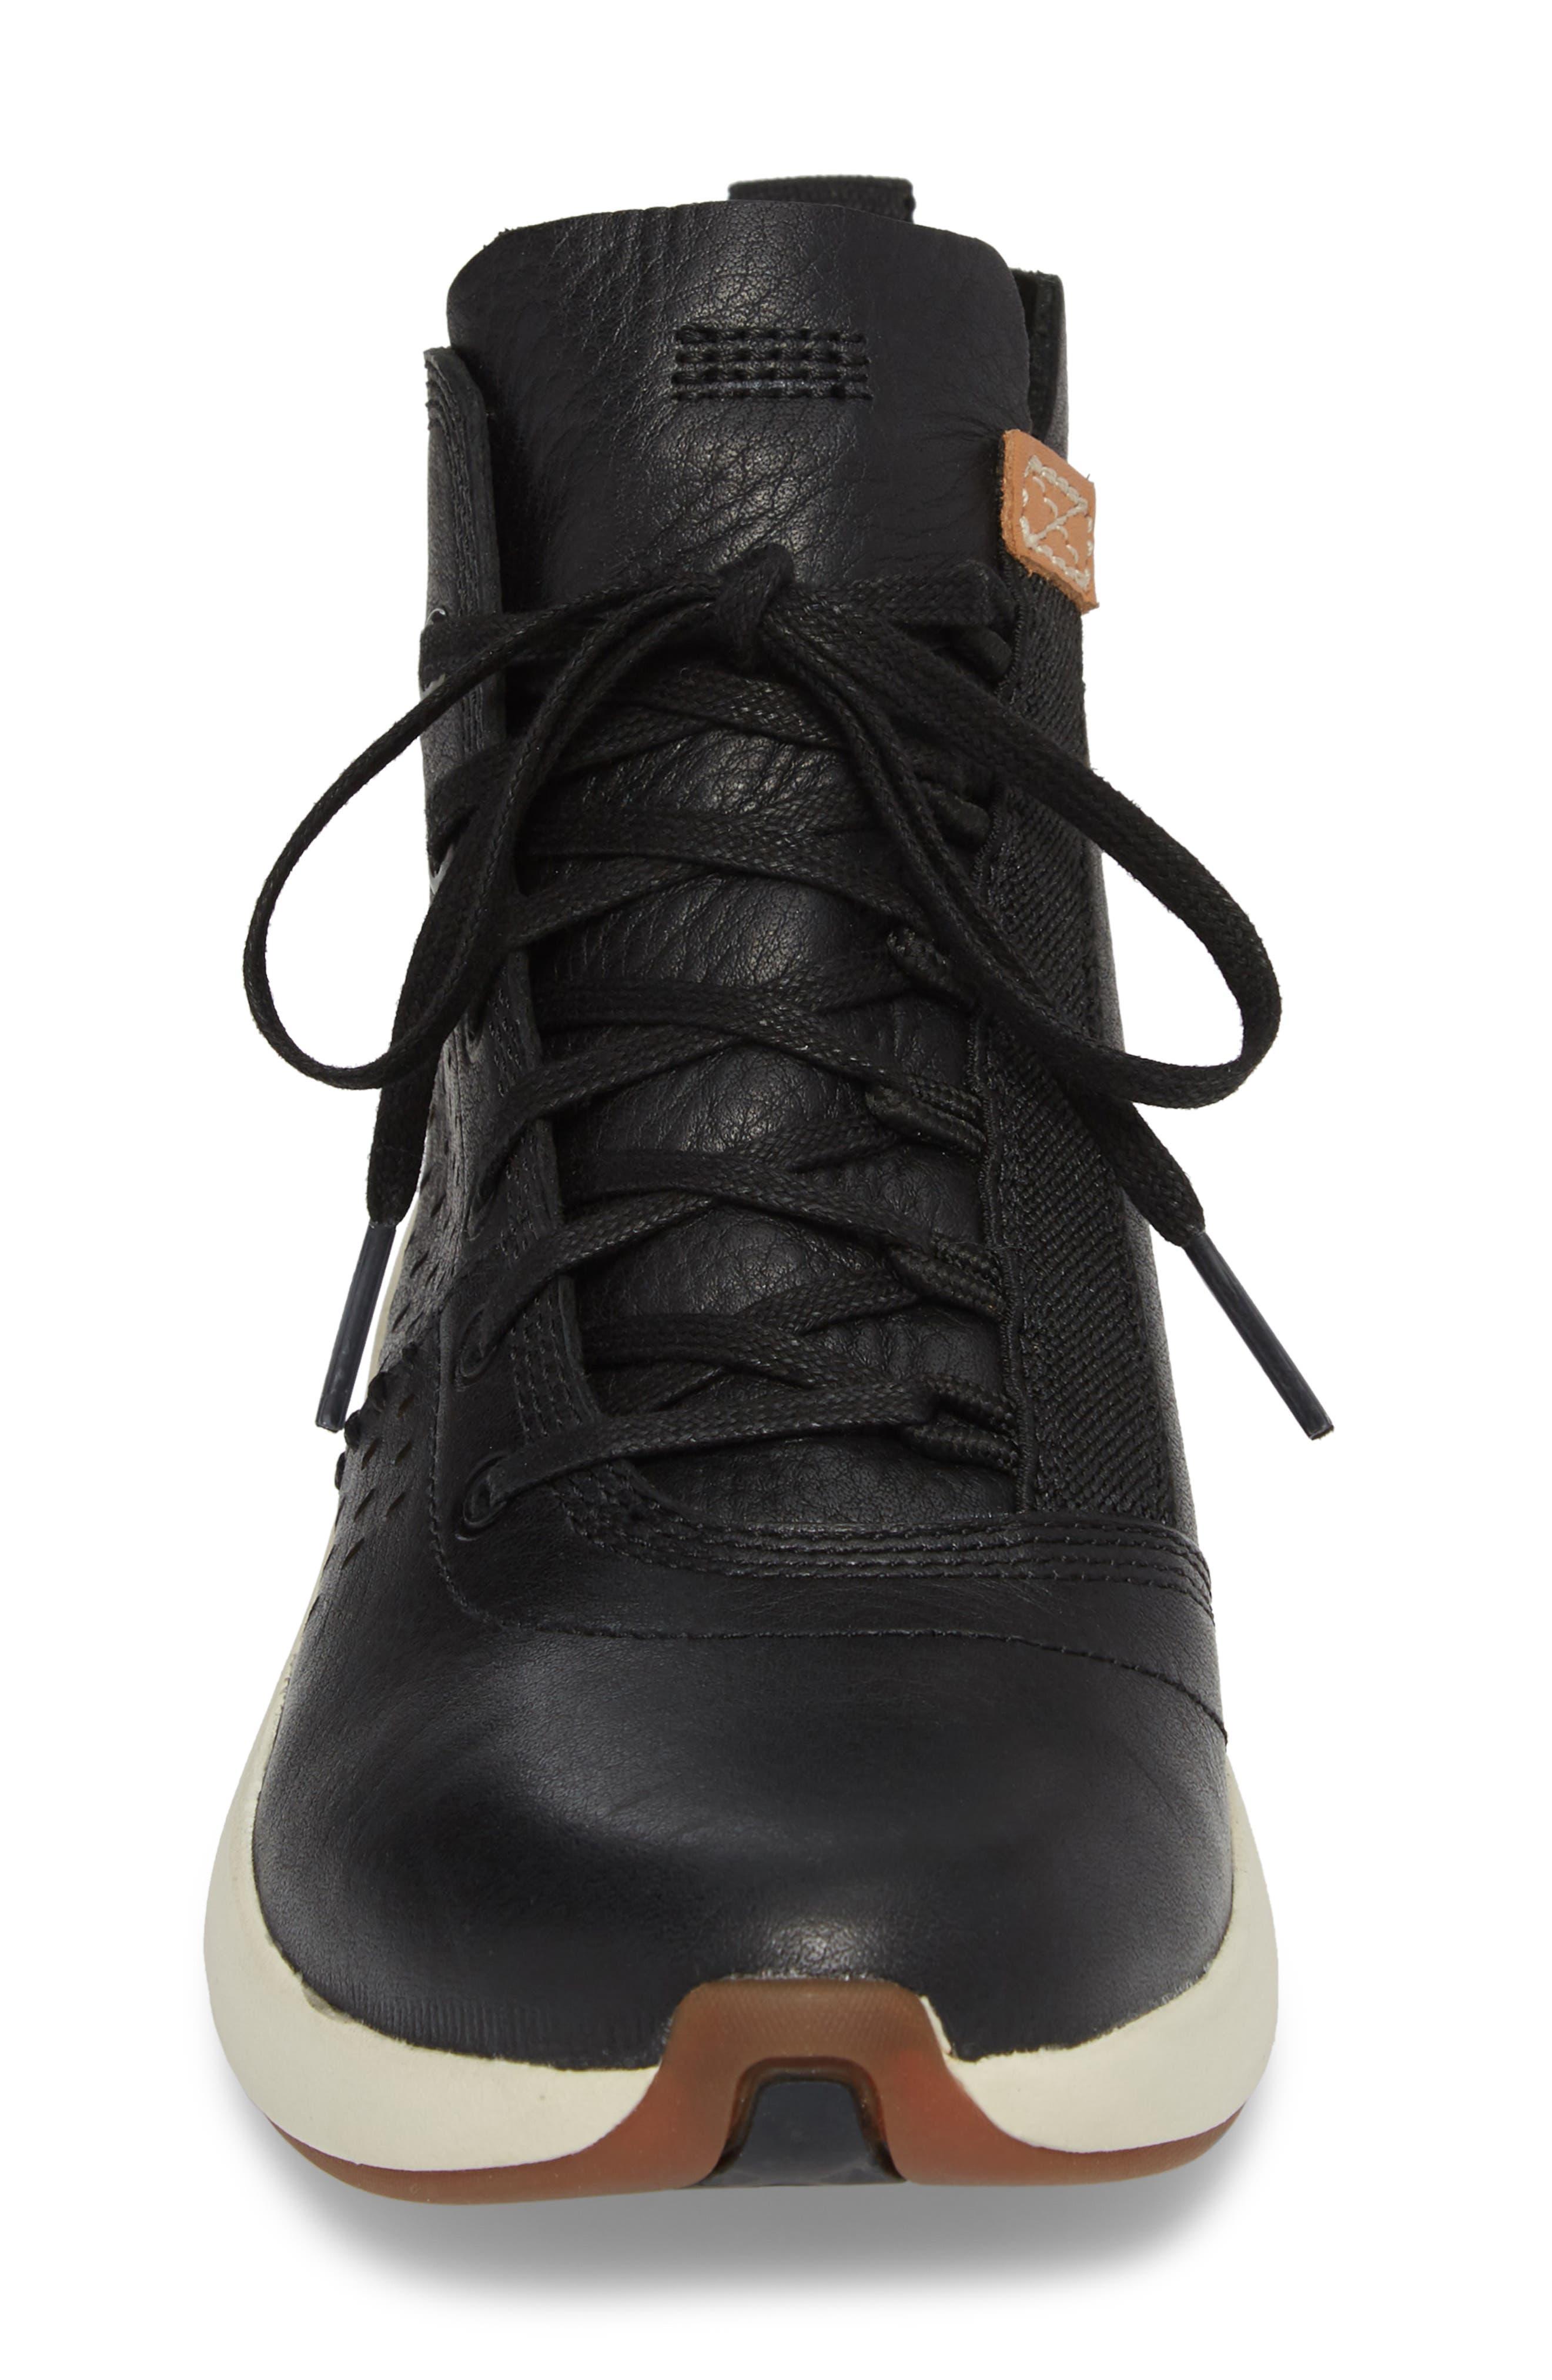 Flyroam Go Chukka Bootie,                             Alternate thumbnail 4, color,                             Black Leather